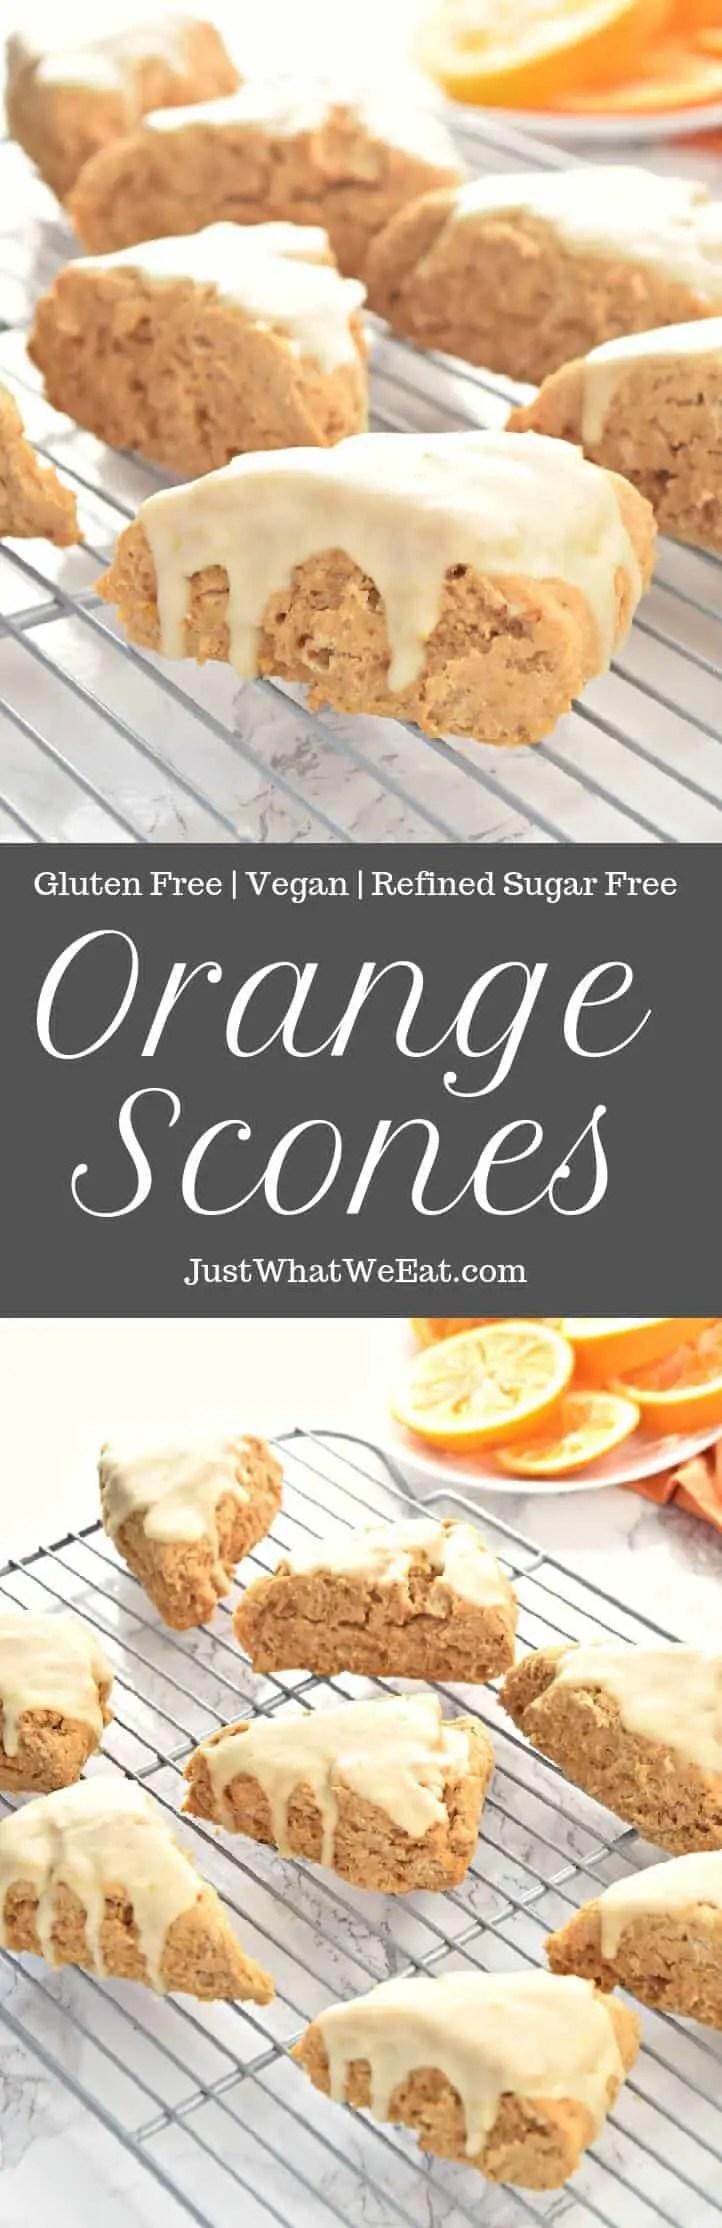 Orange Scones - Gluten Free, Vegan, and Refined Sugar Free